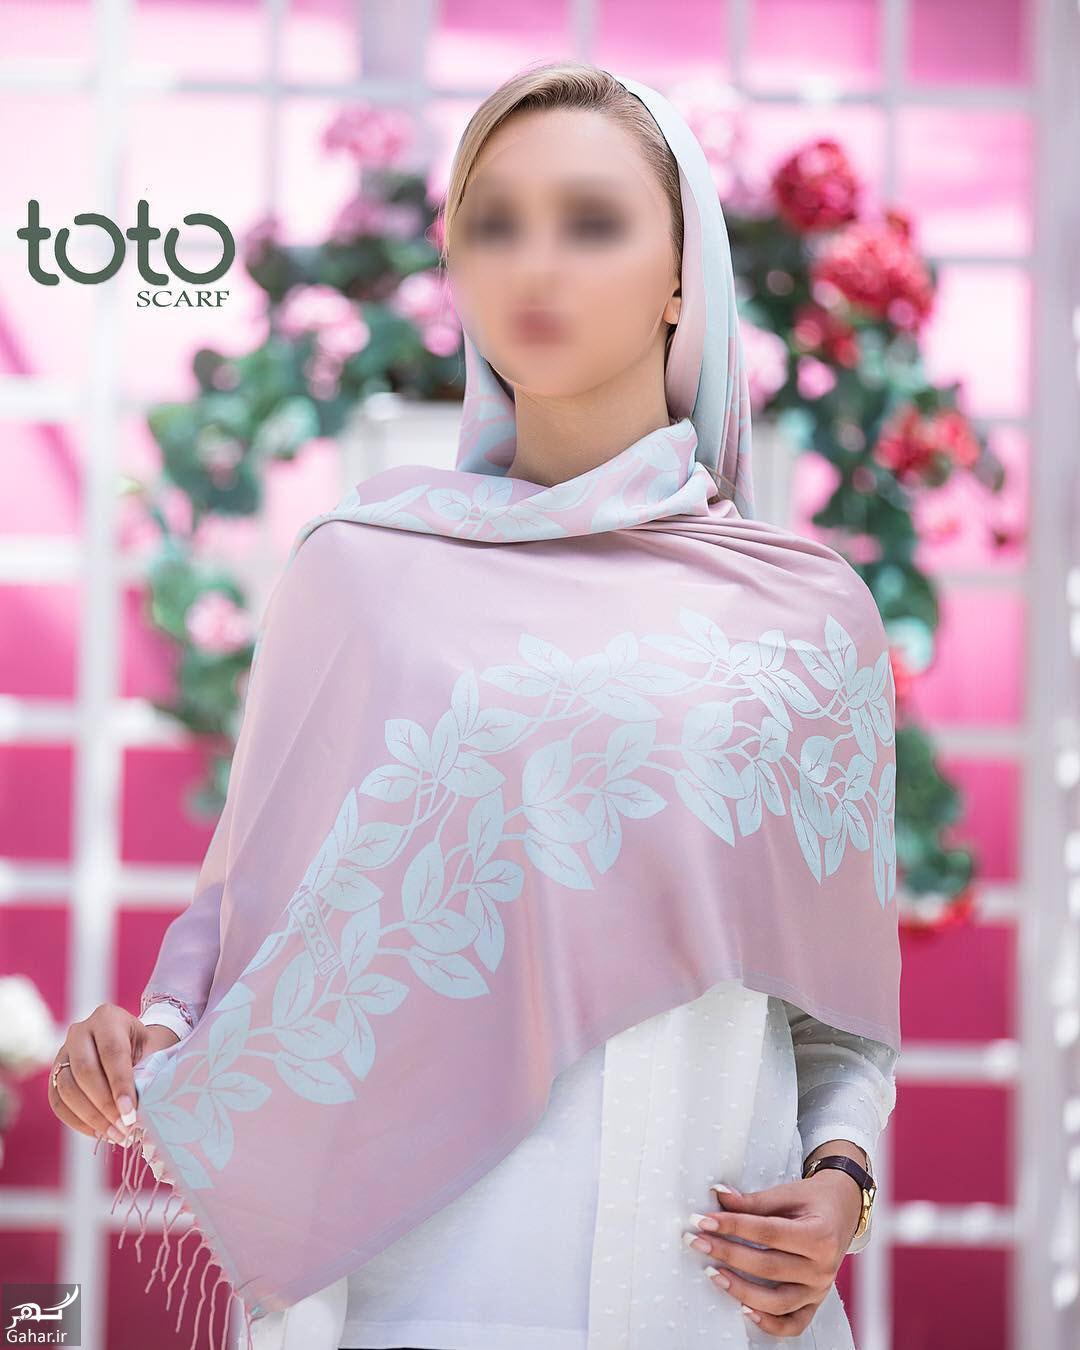 273282 Gahar ir جدیدترین مدل های شال و روسری از برند ایرانی توتو